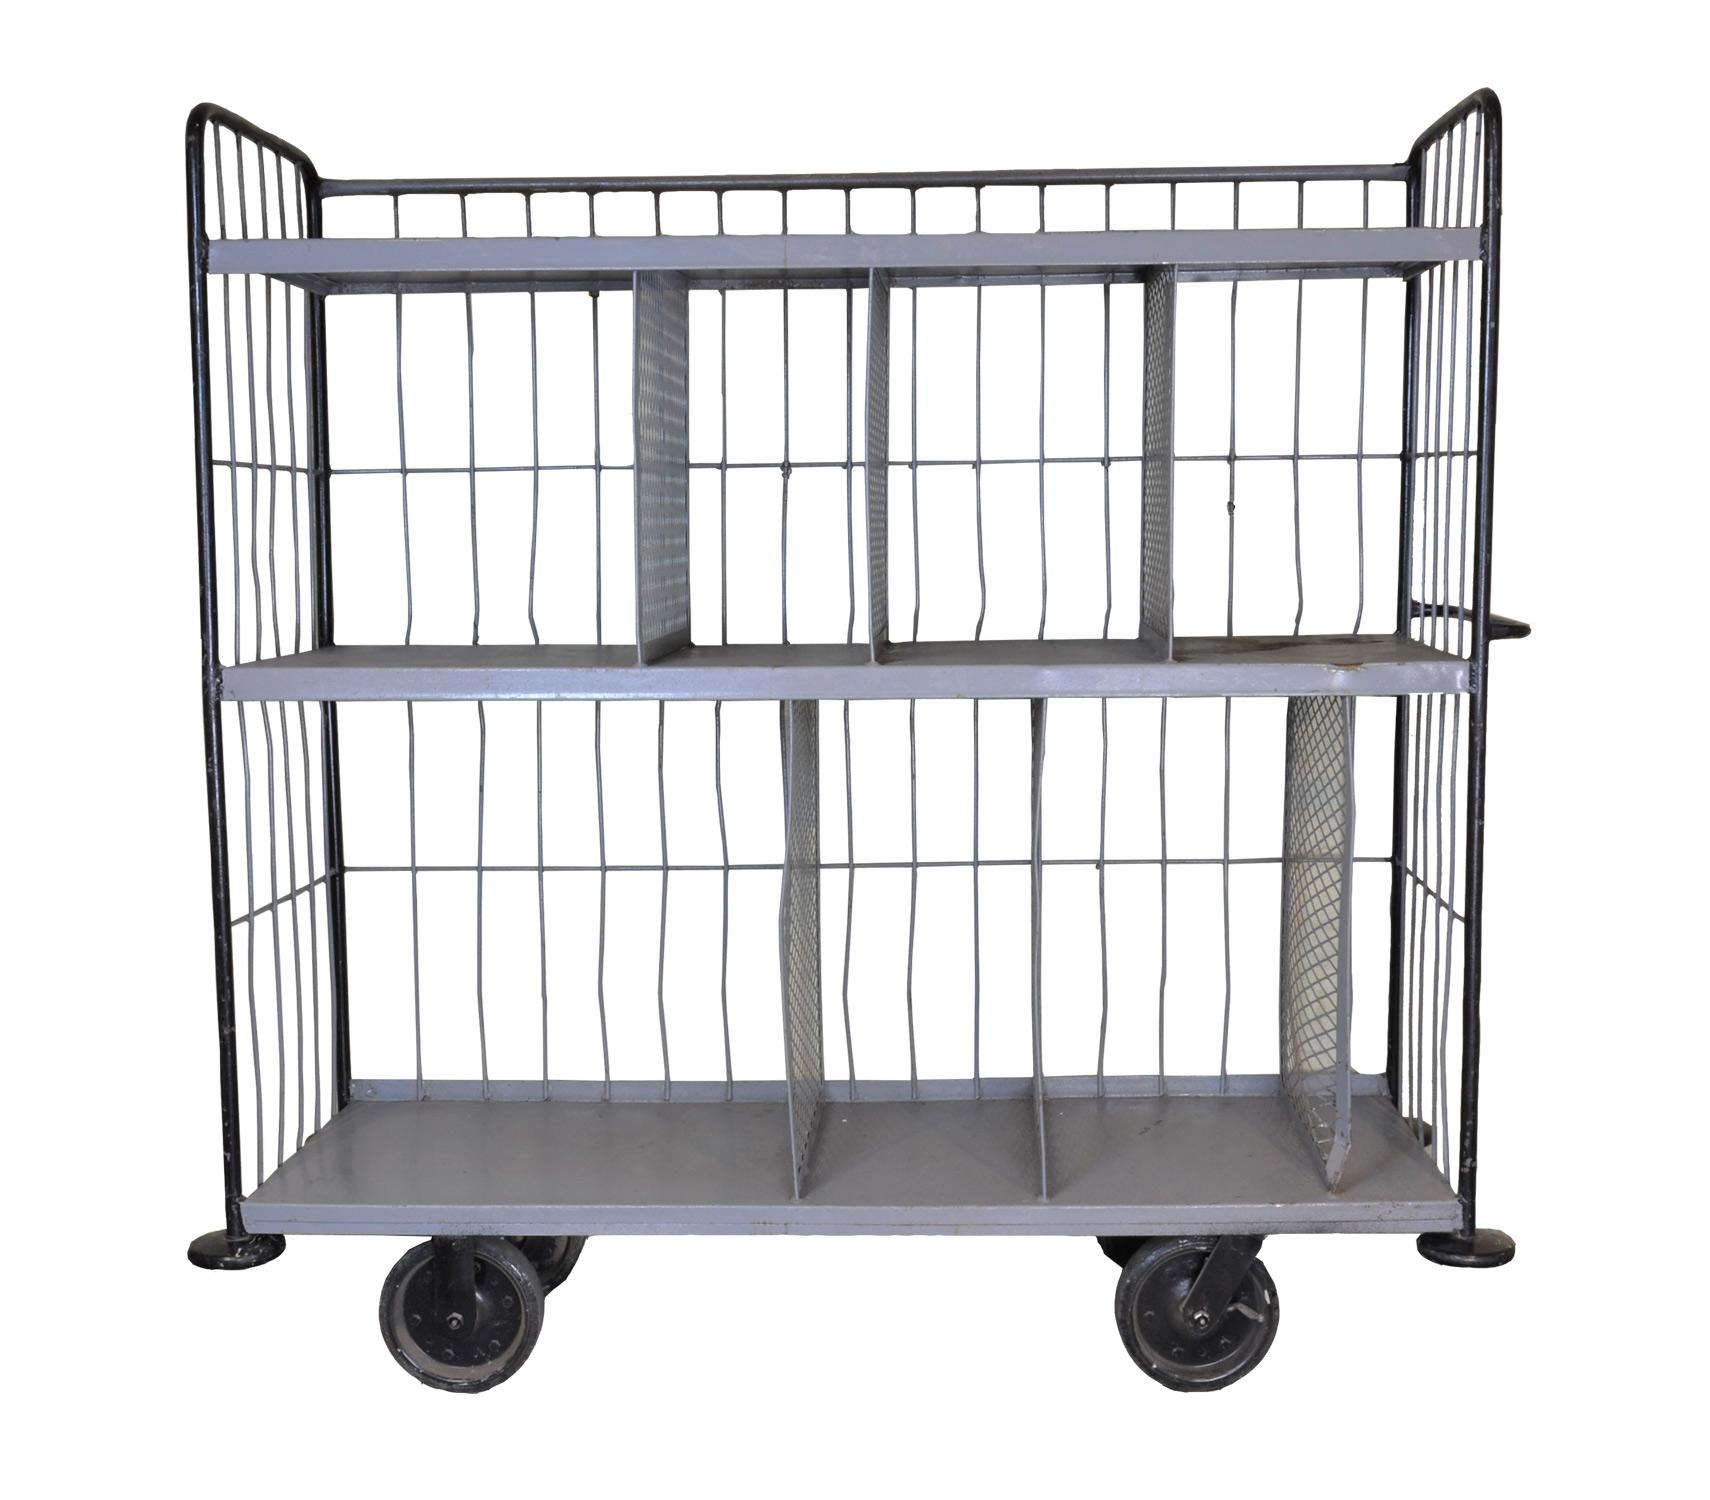 large steel warehouse cart